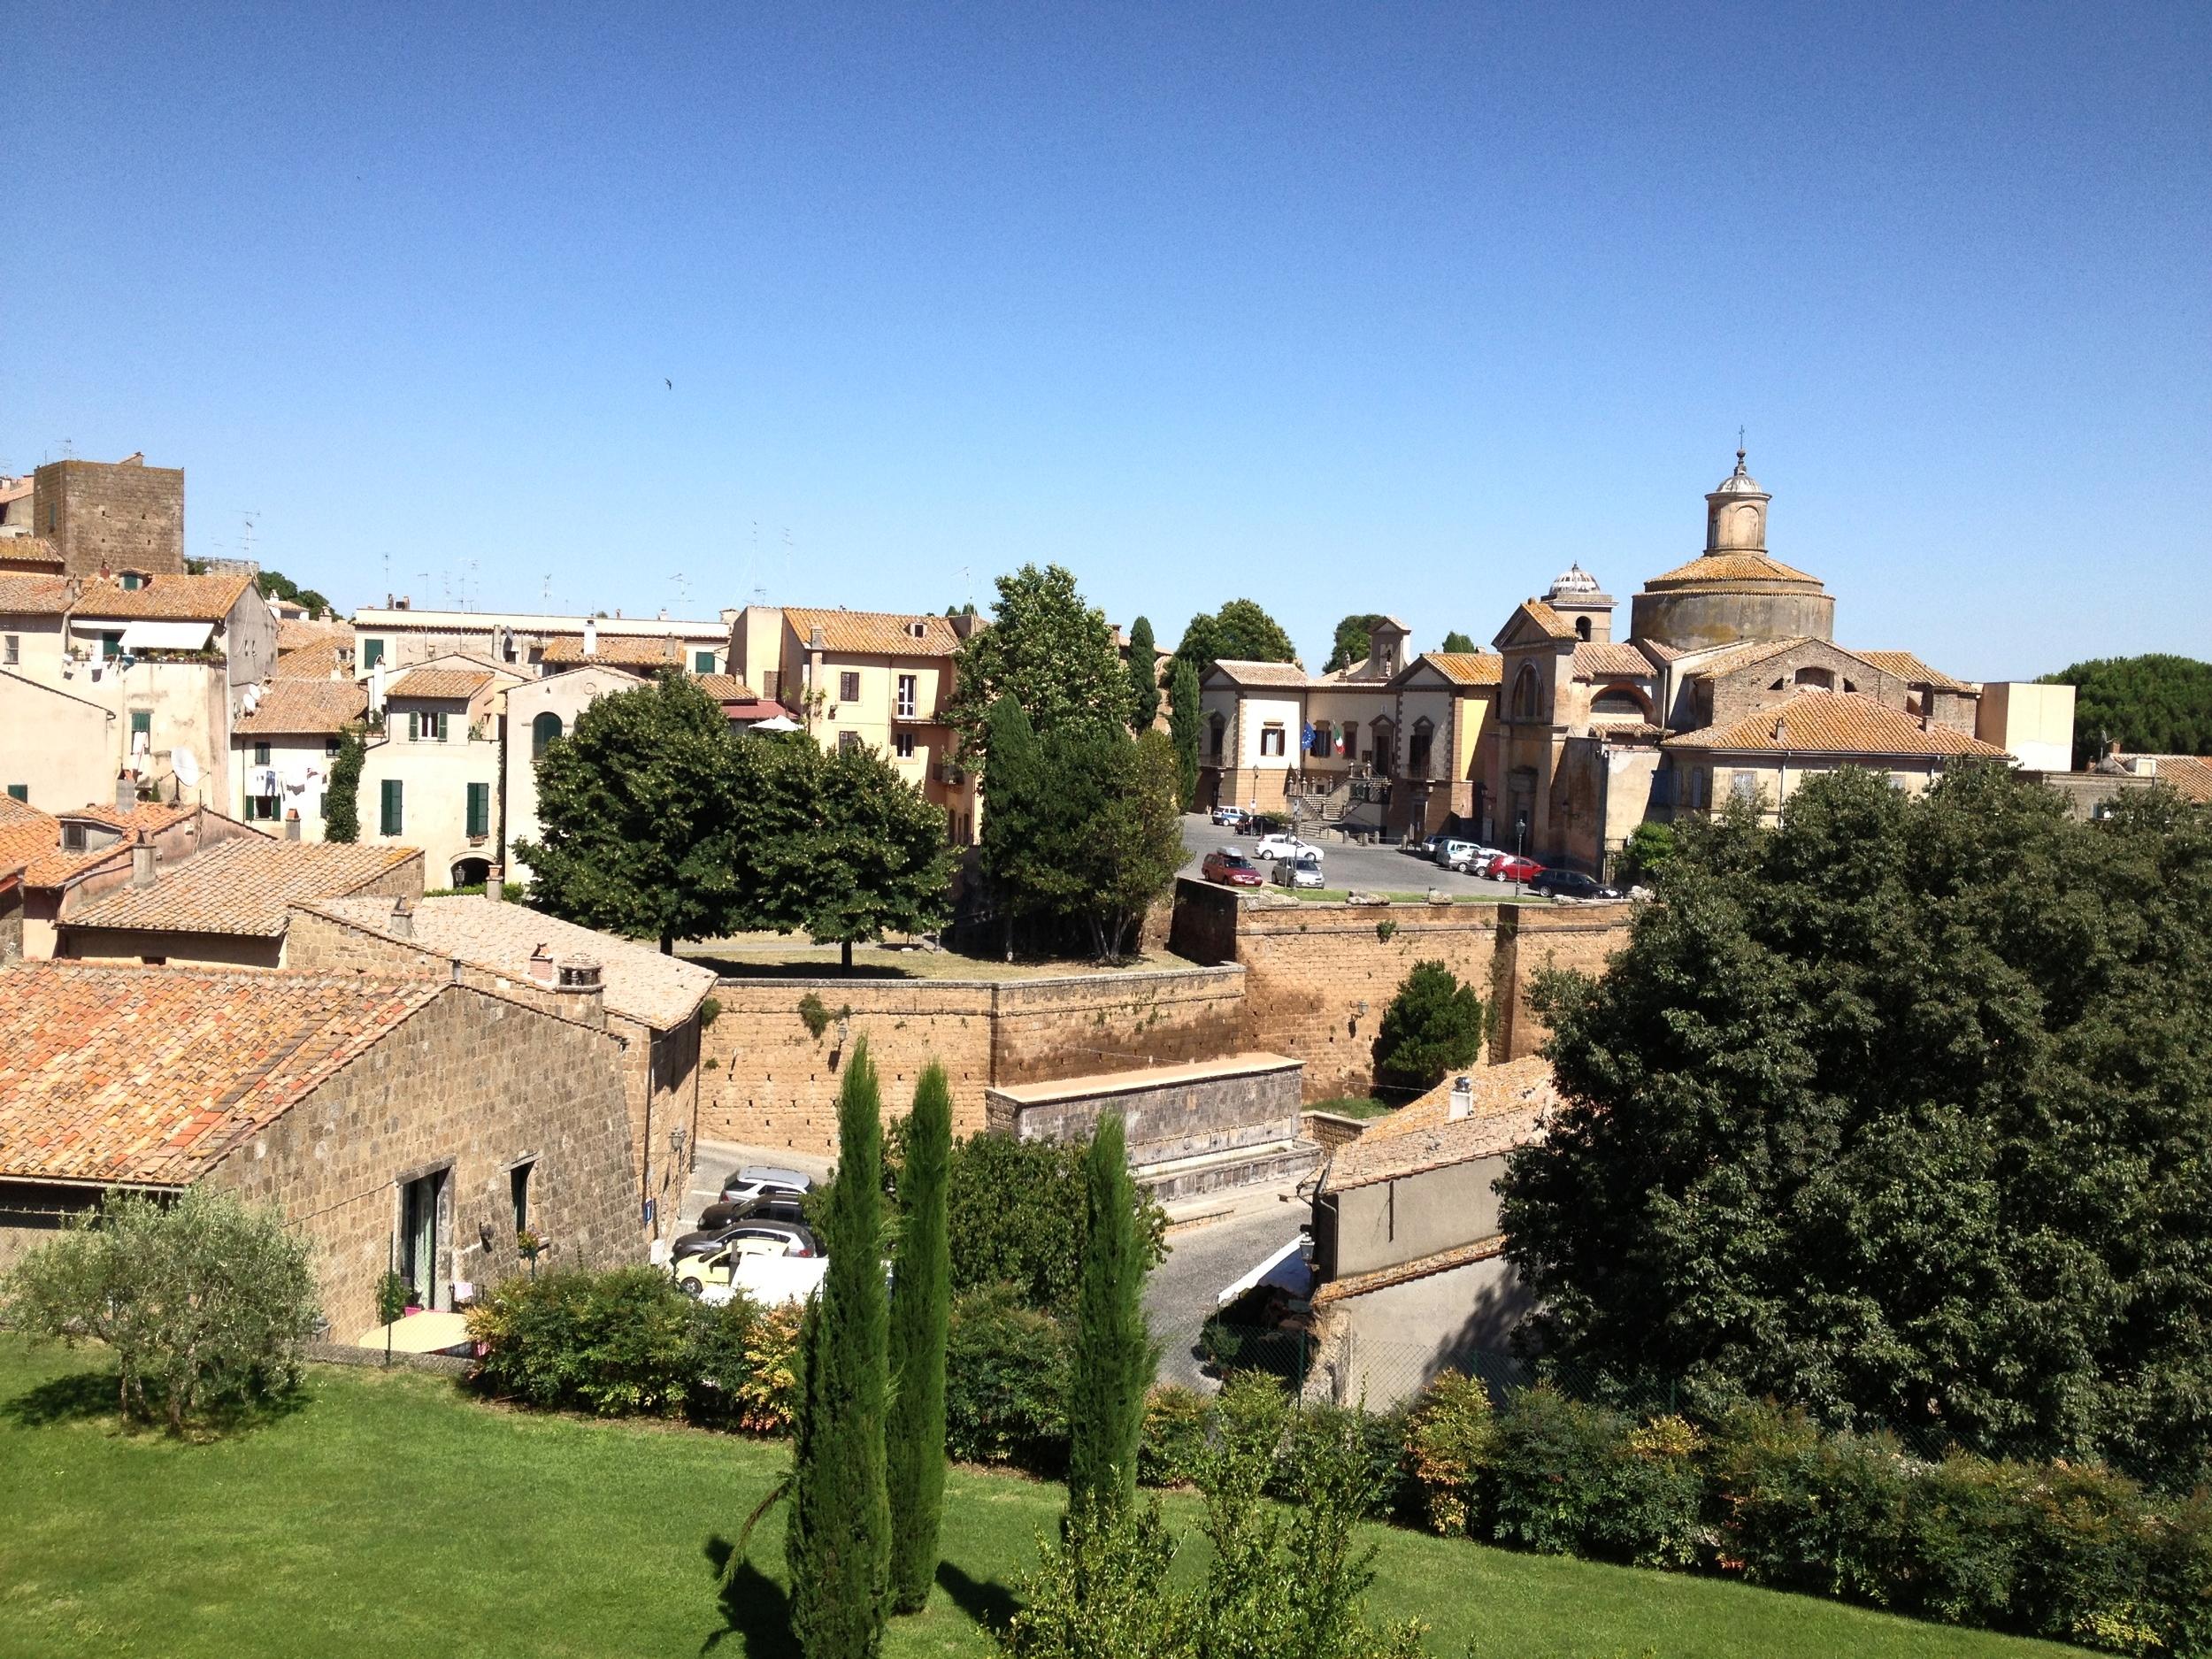 Tuscania, city of #nofilter photos